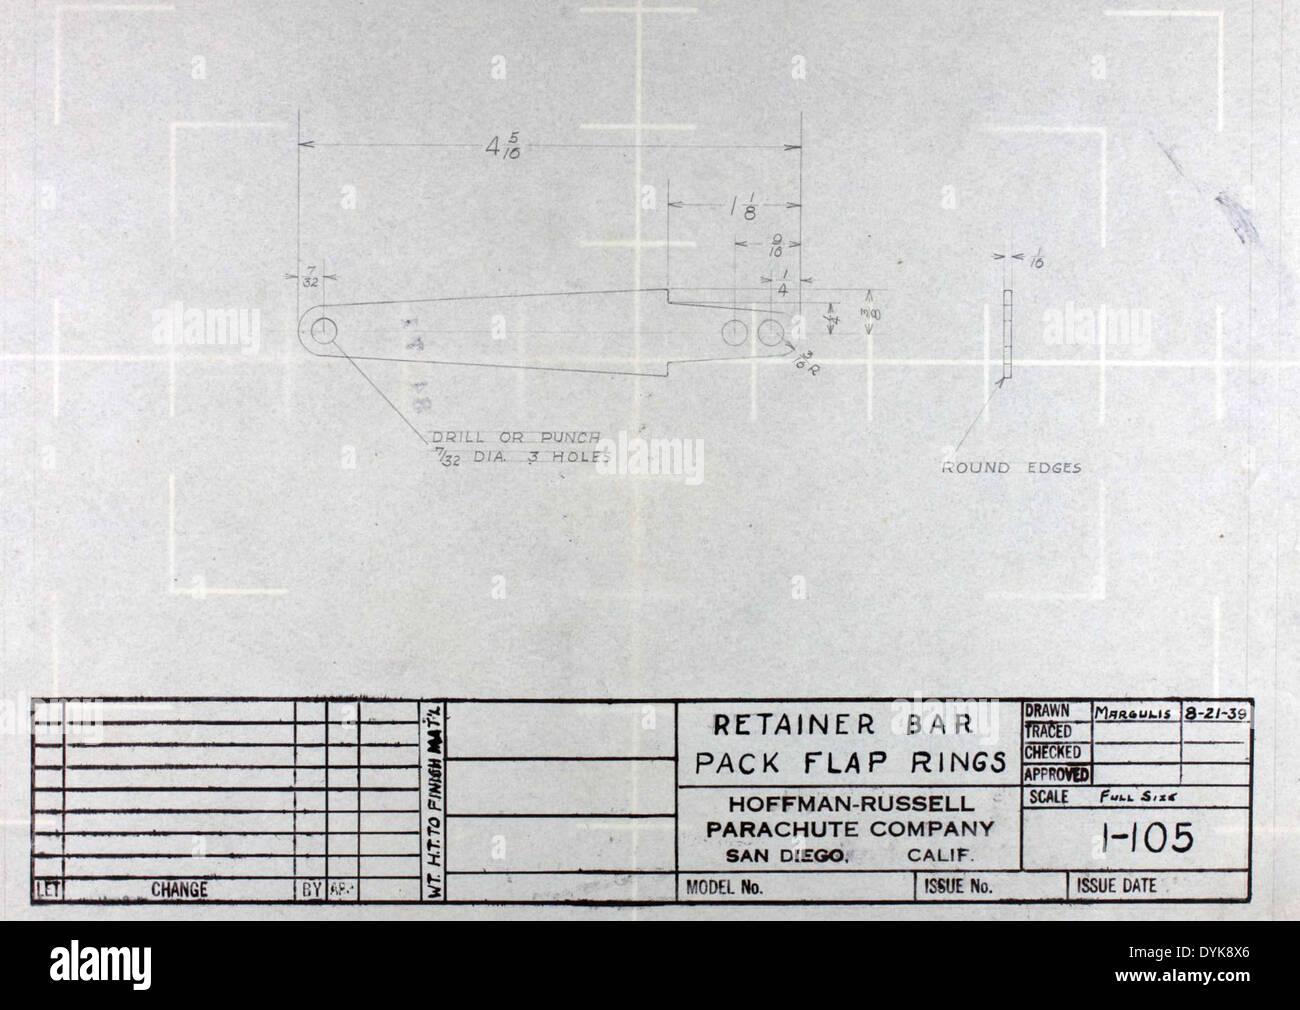 Bauplan: Halter Bar Pack Klappe Ringe Stockfoto, Bild: 68650910 - Alamy